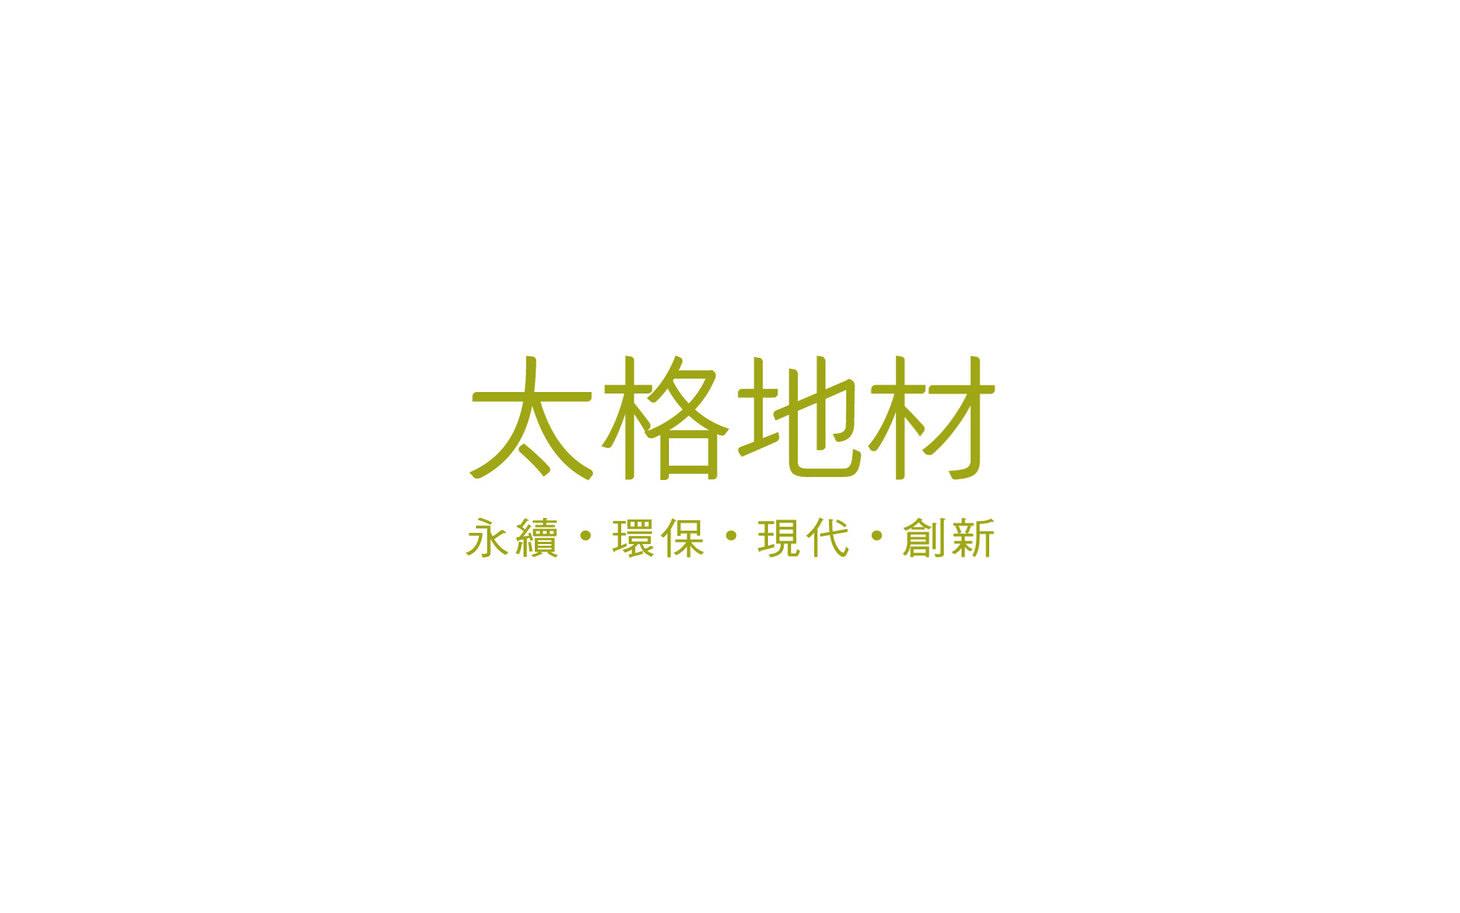 SEMI_太格地材_logo_20150226.jpg